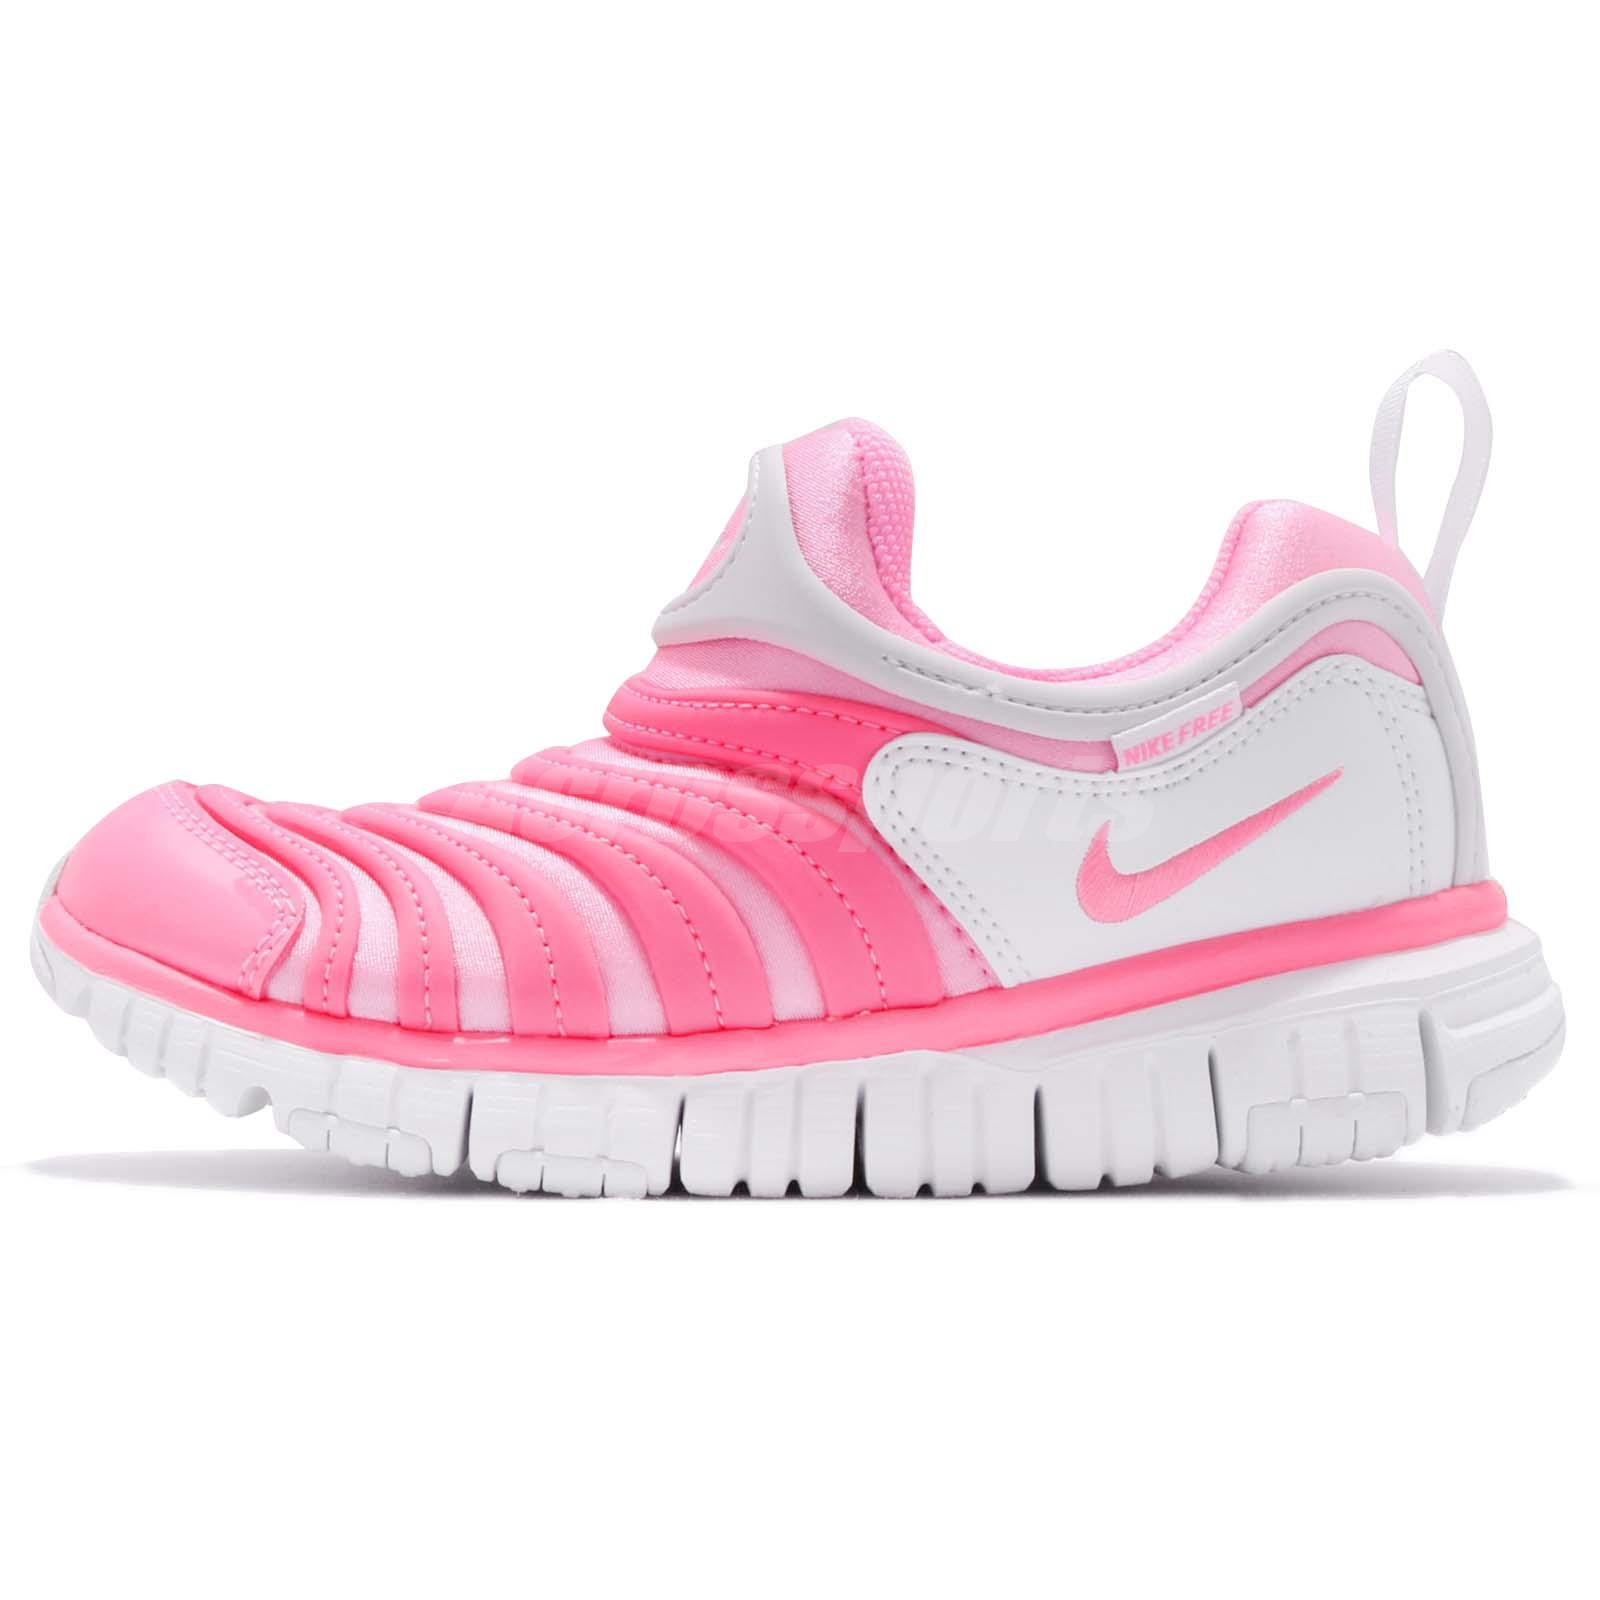 8e34942700cd ... new zealand nike dynamo free ps pink beam white preschool kids junior  girls shoes 343738 625